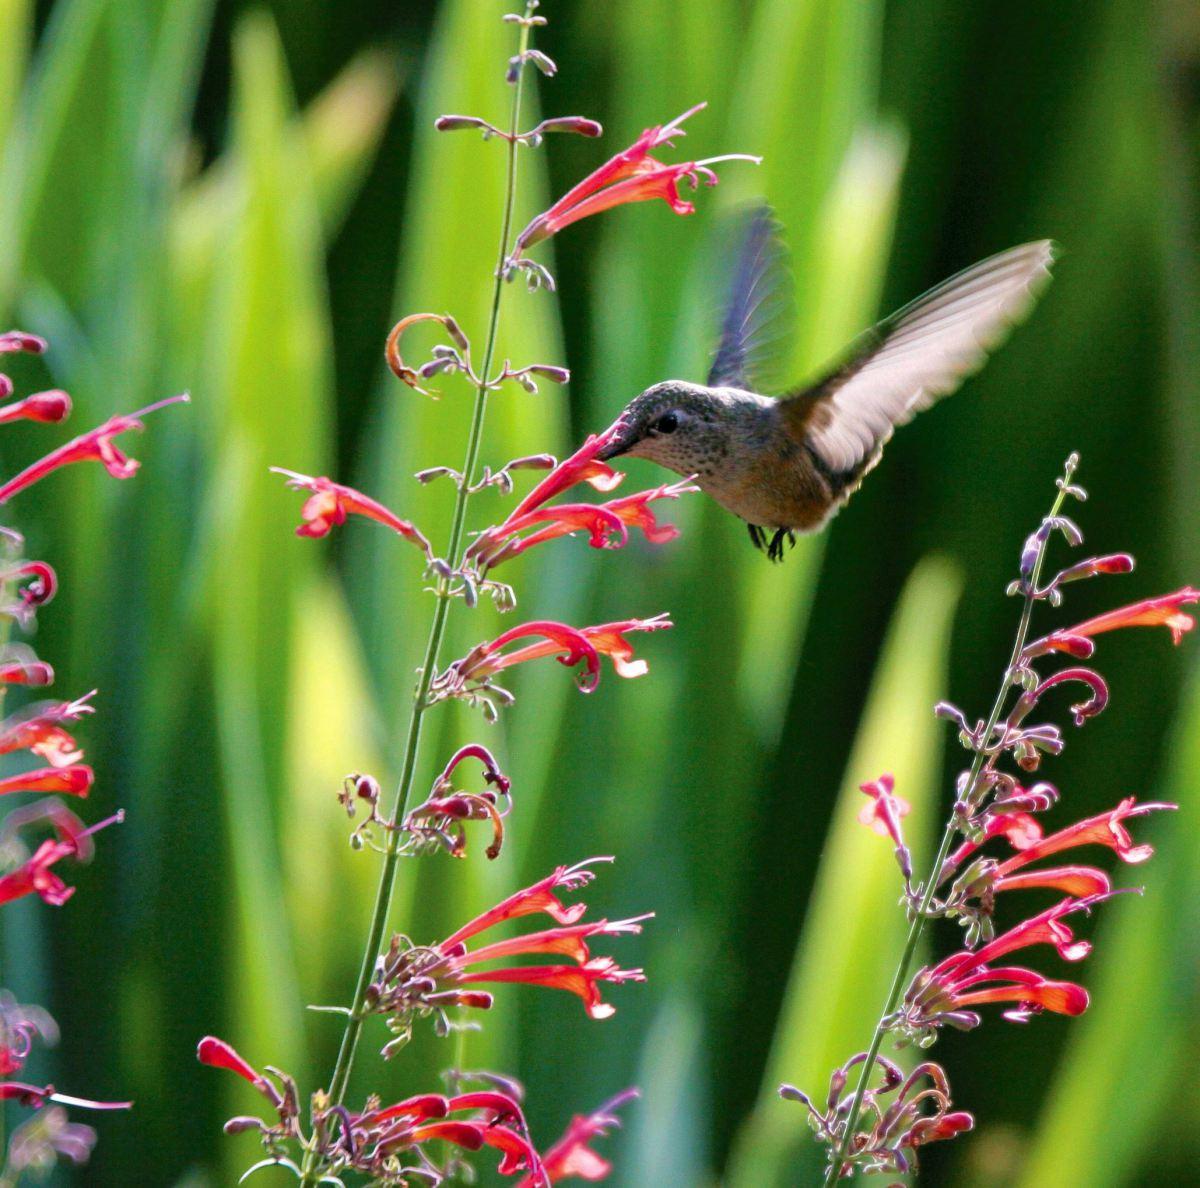 Wshg Net Gardening To Attract Hummingbirds And Butterflies Featured The Garden July 15